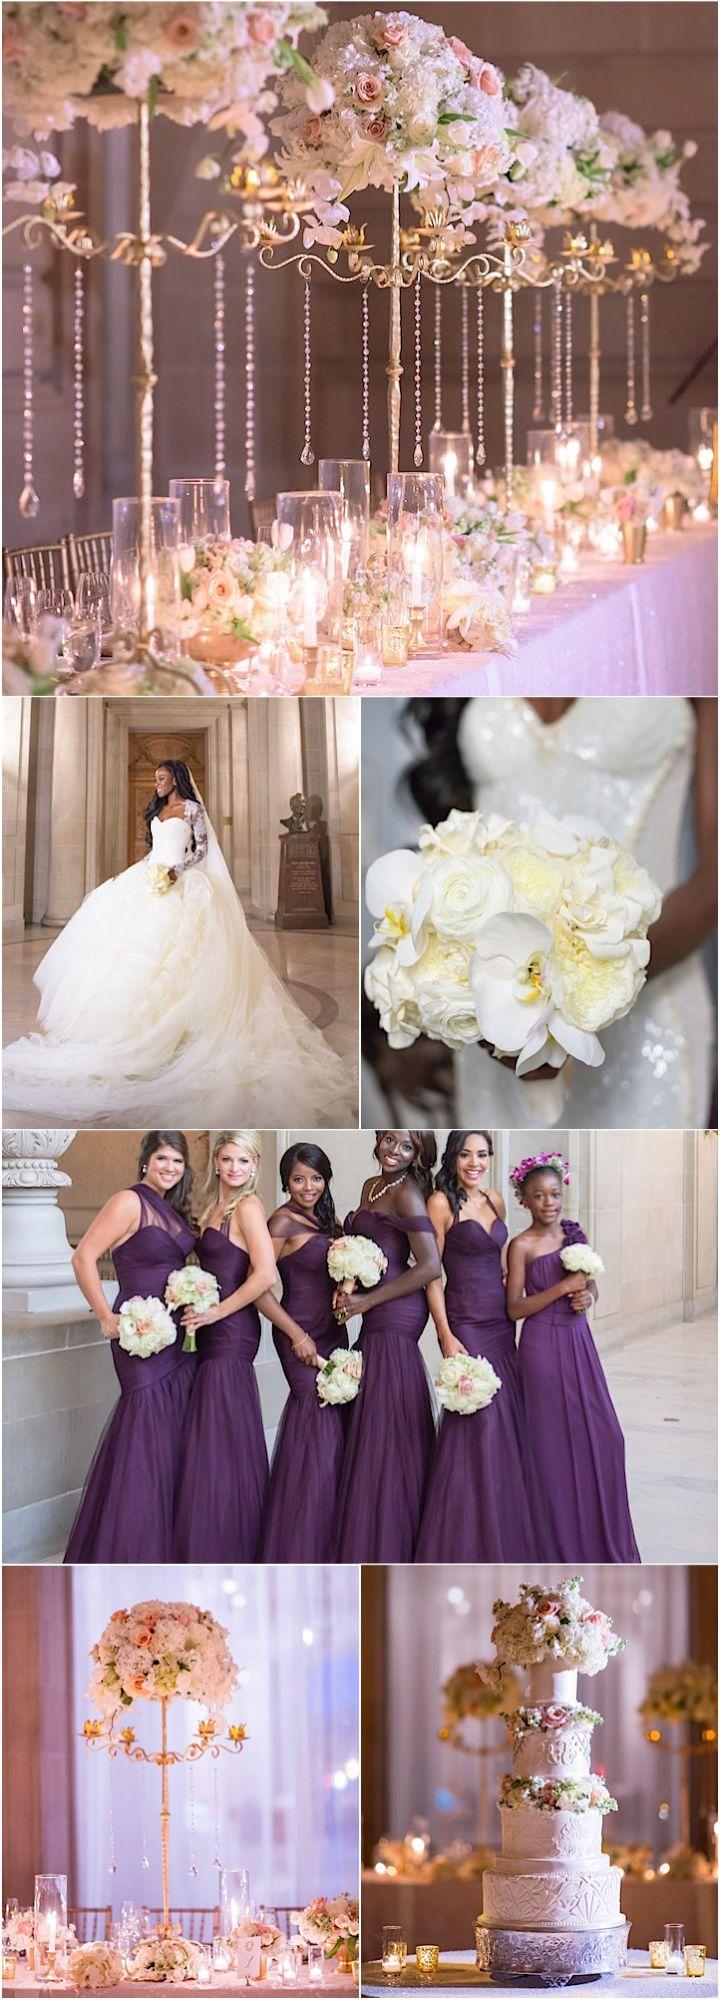 Featured Photographer: Vero Suh; Glamorous ballroom wedding theme